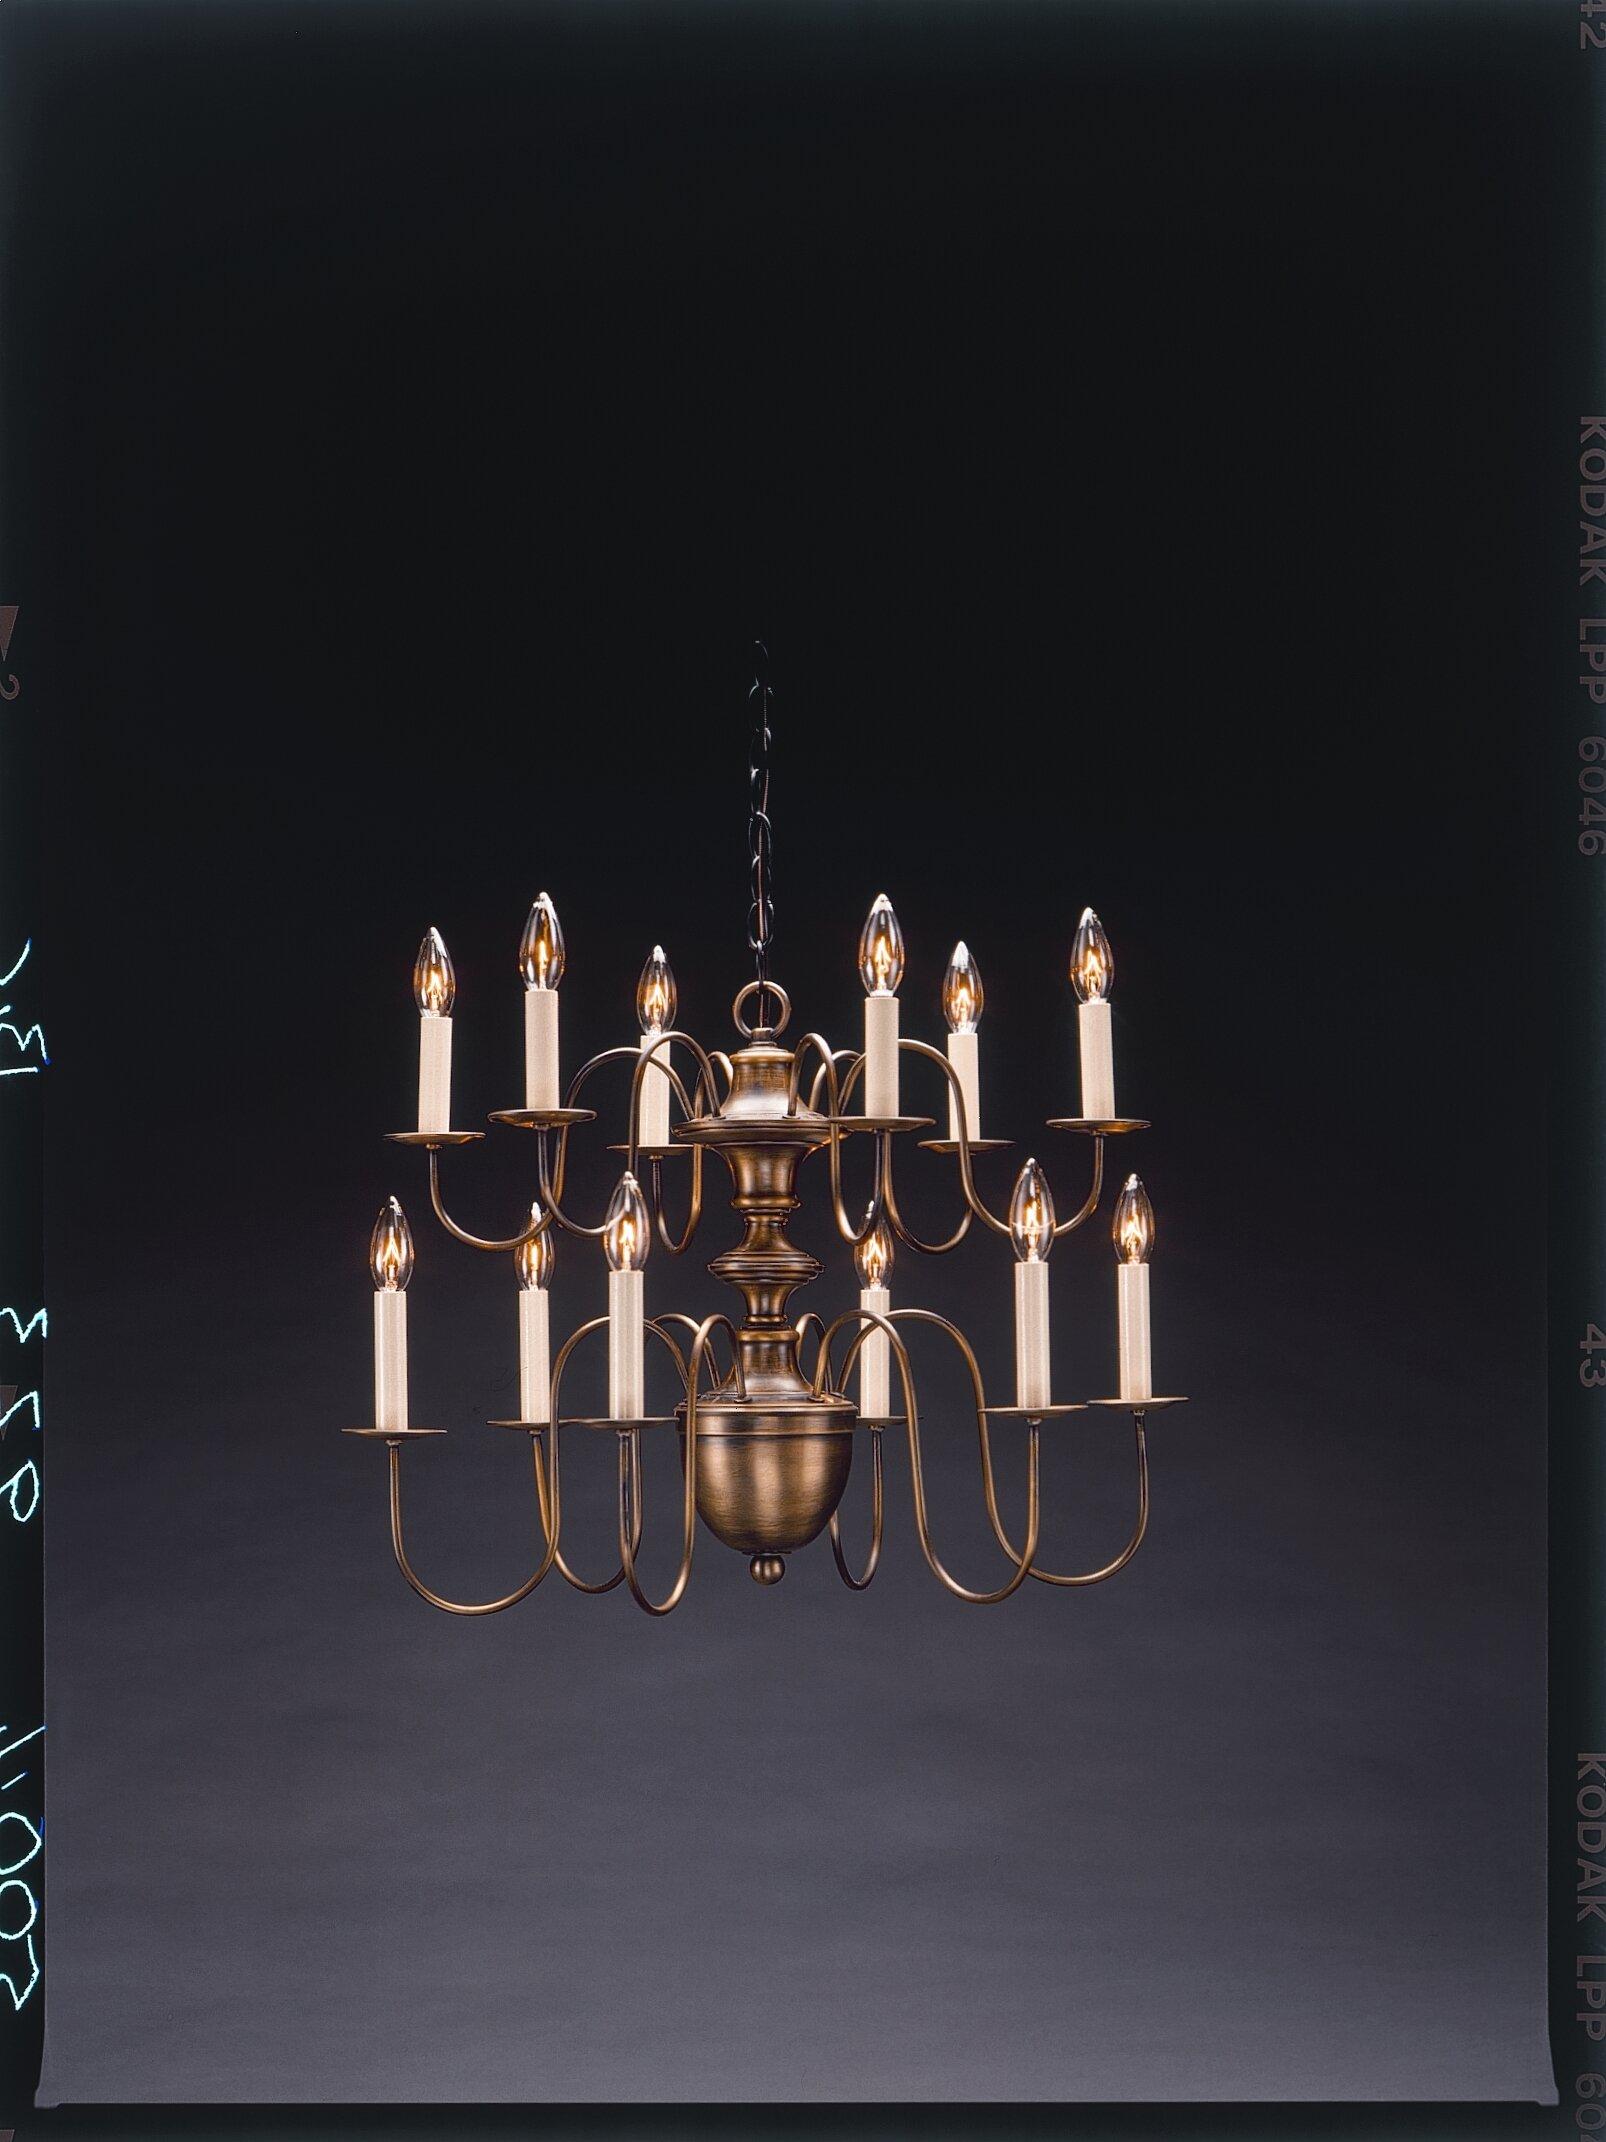 Northeast Lantern Sockets Hanging 2 Tier Half Ball S Arms 12 Light Candle Style Chandelier Wayfair